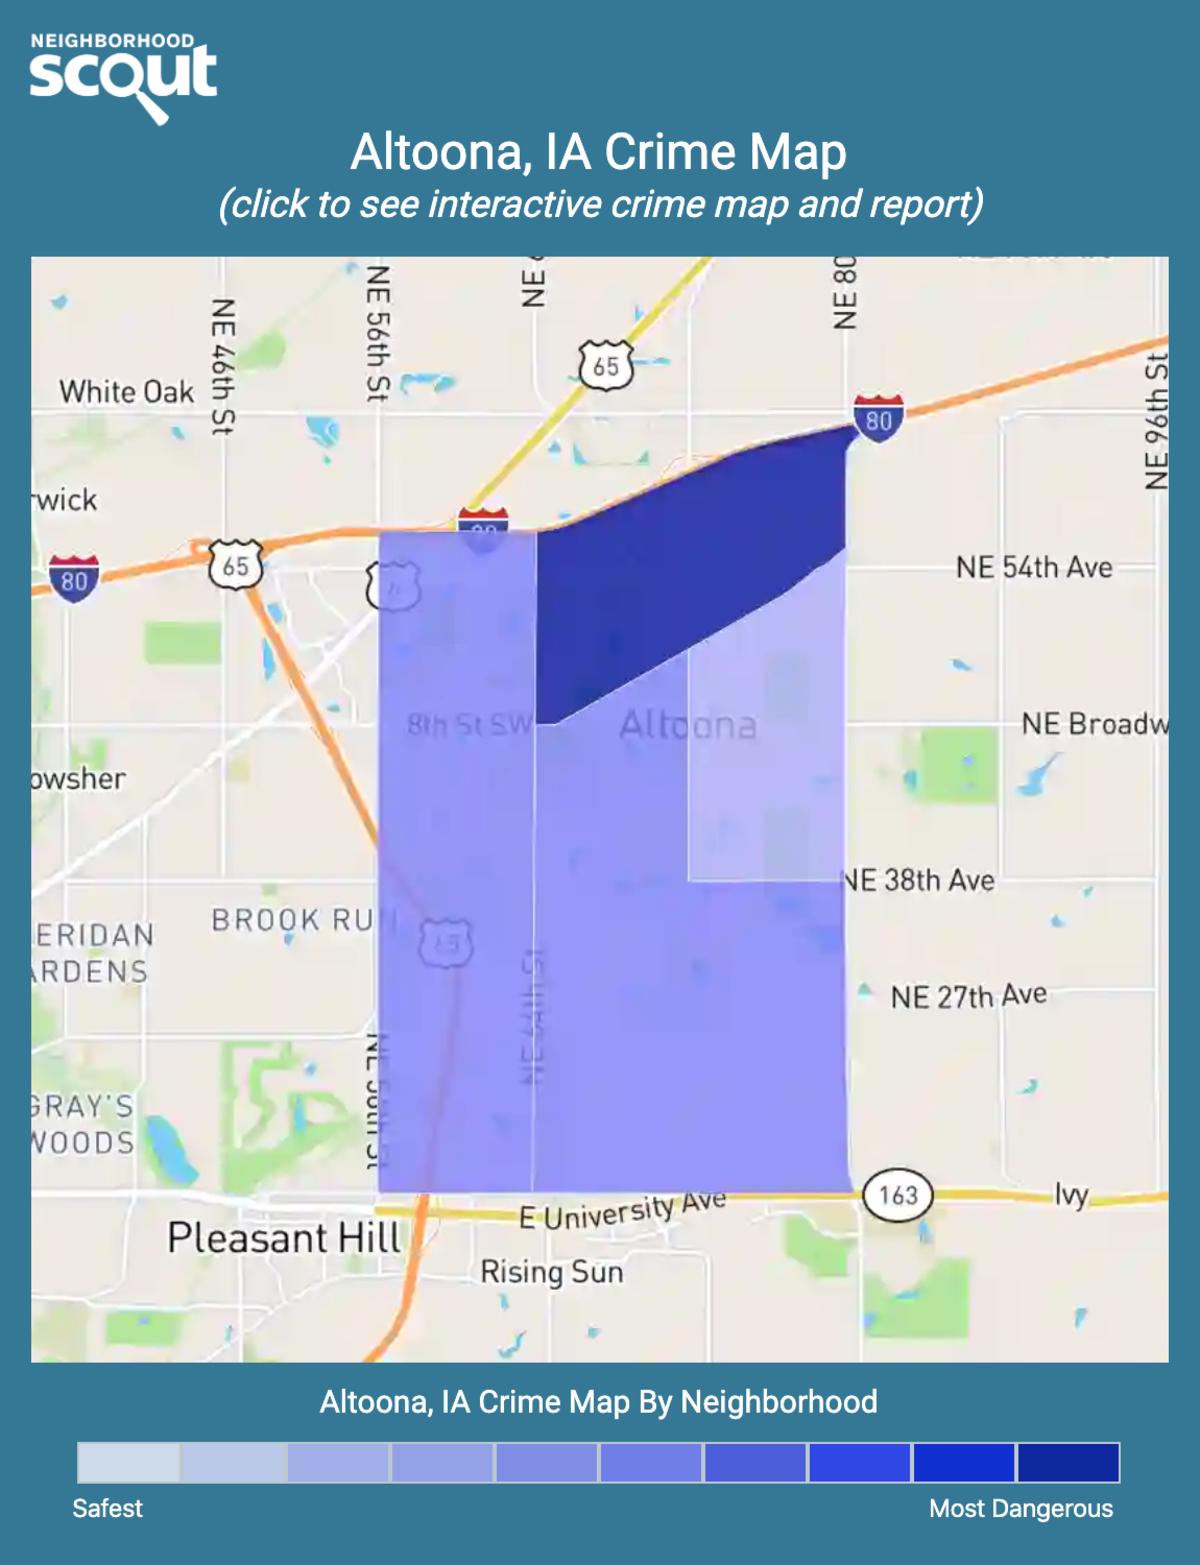 Altoona, Iowa crime map